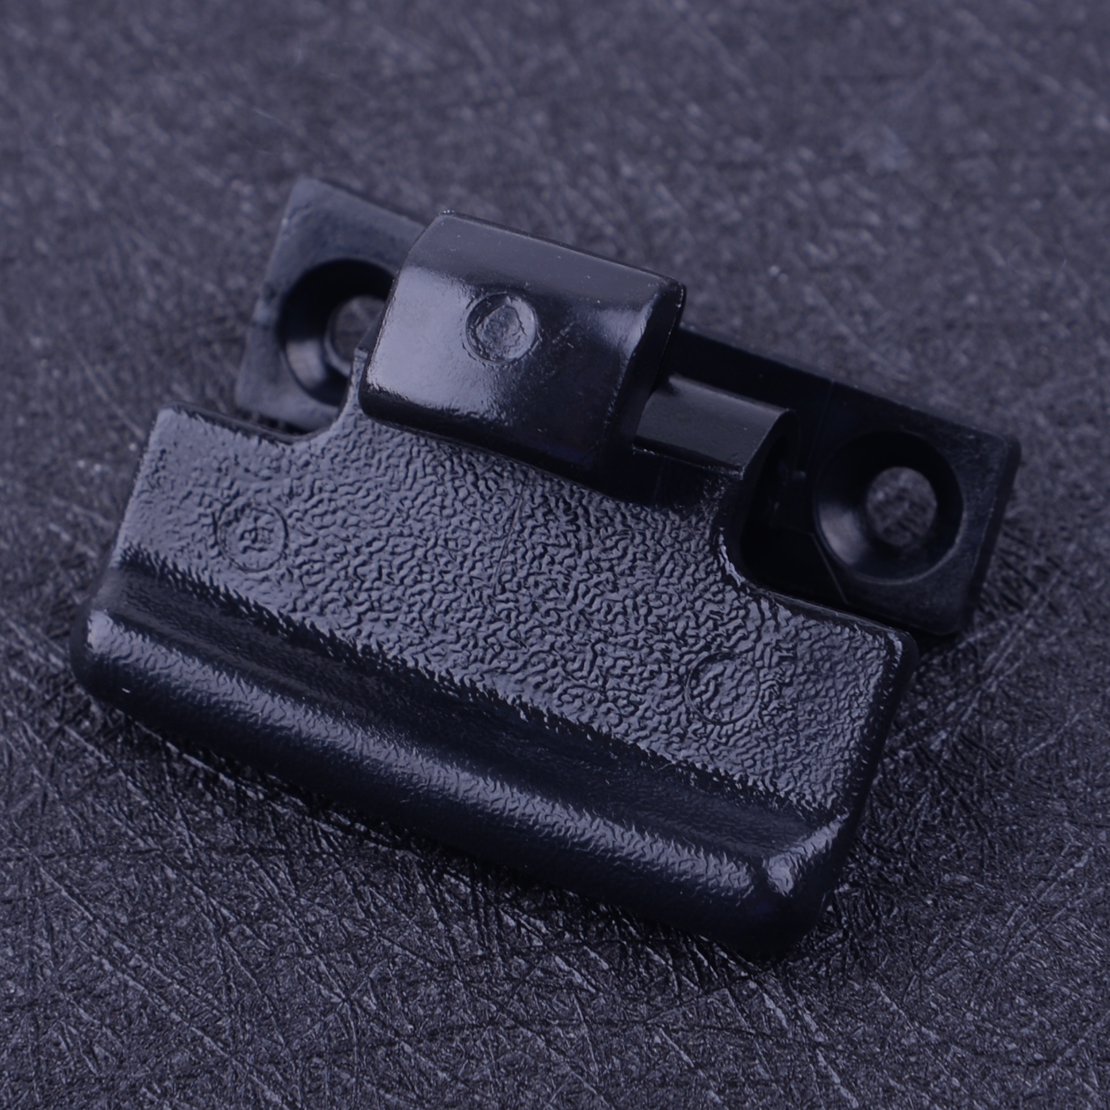 CITALL New Car Upper Armrest Box Lock Cover Switch Snaps MR532555 Fit For Mitsubishi Pajero V73 V75 V77 V93 V97|Armrests| |  - title=